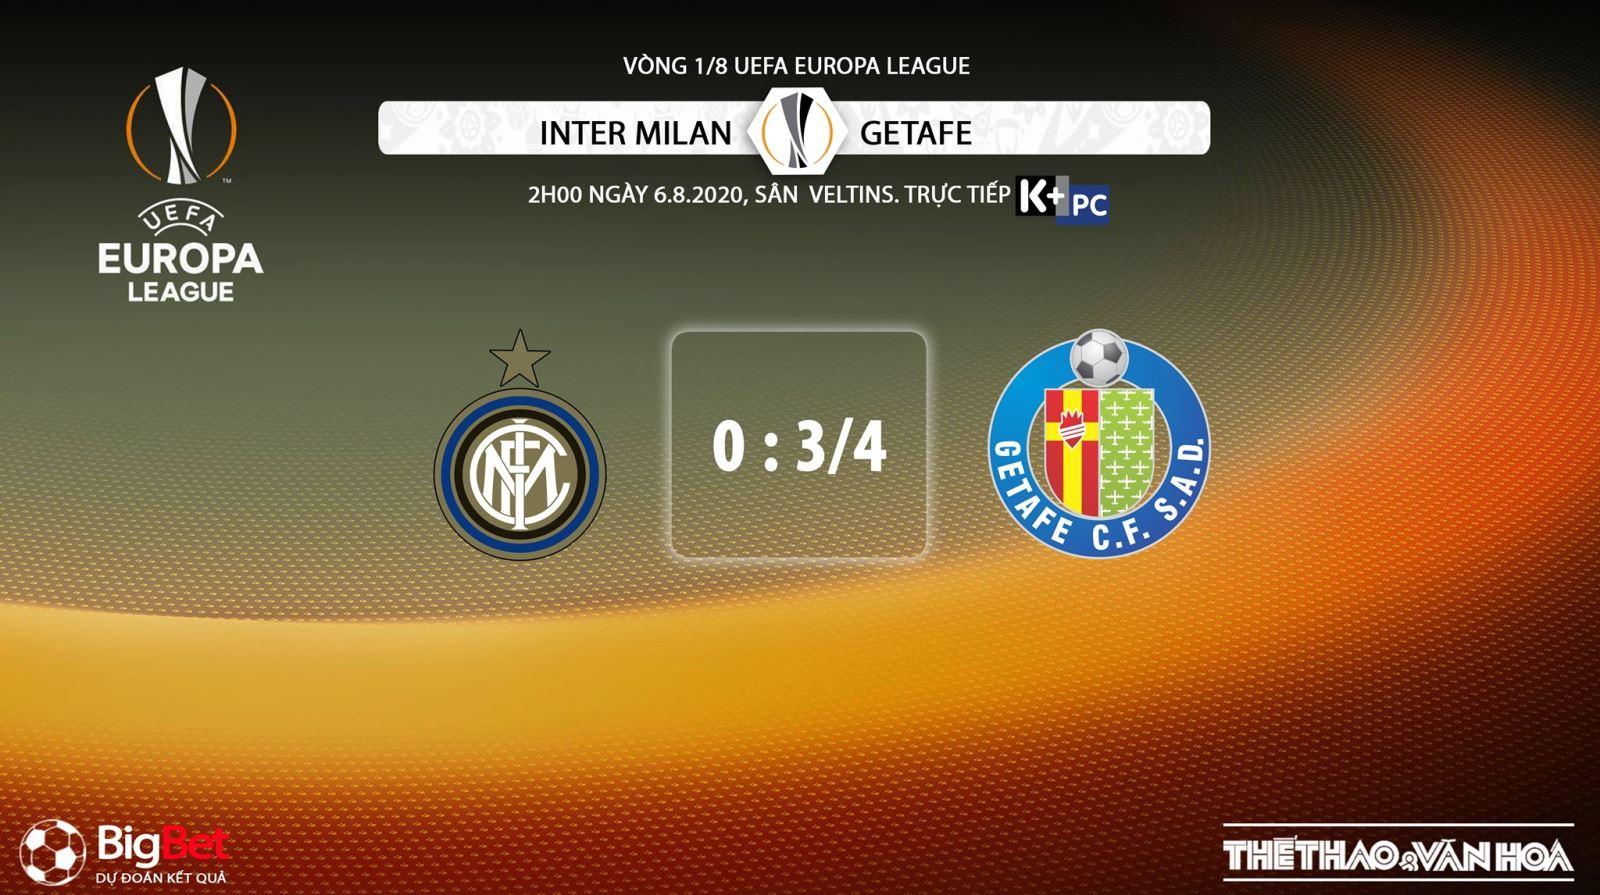 Inter Milan vs Getafe, Inter, Getafe, soi kèo Inter Milan vs Getafe, nhận định, kèo bóng đá, soi kèo bóng đá, soi kèo